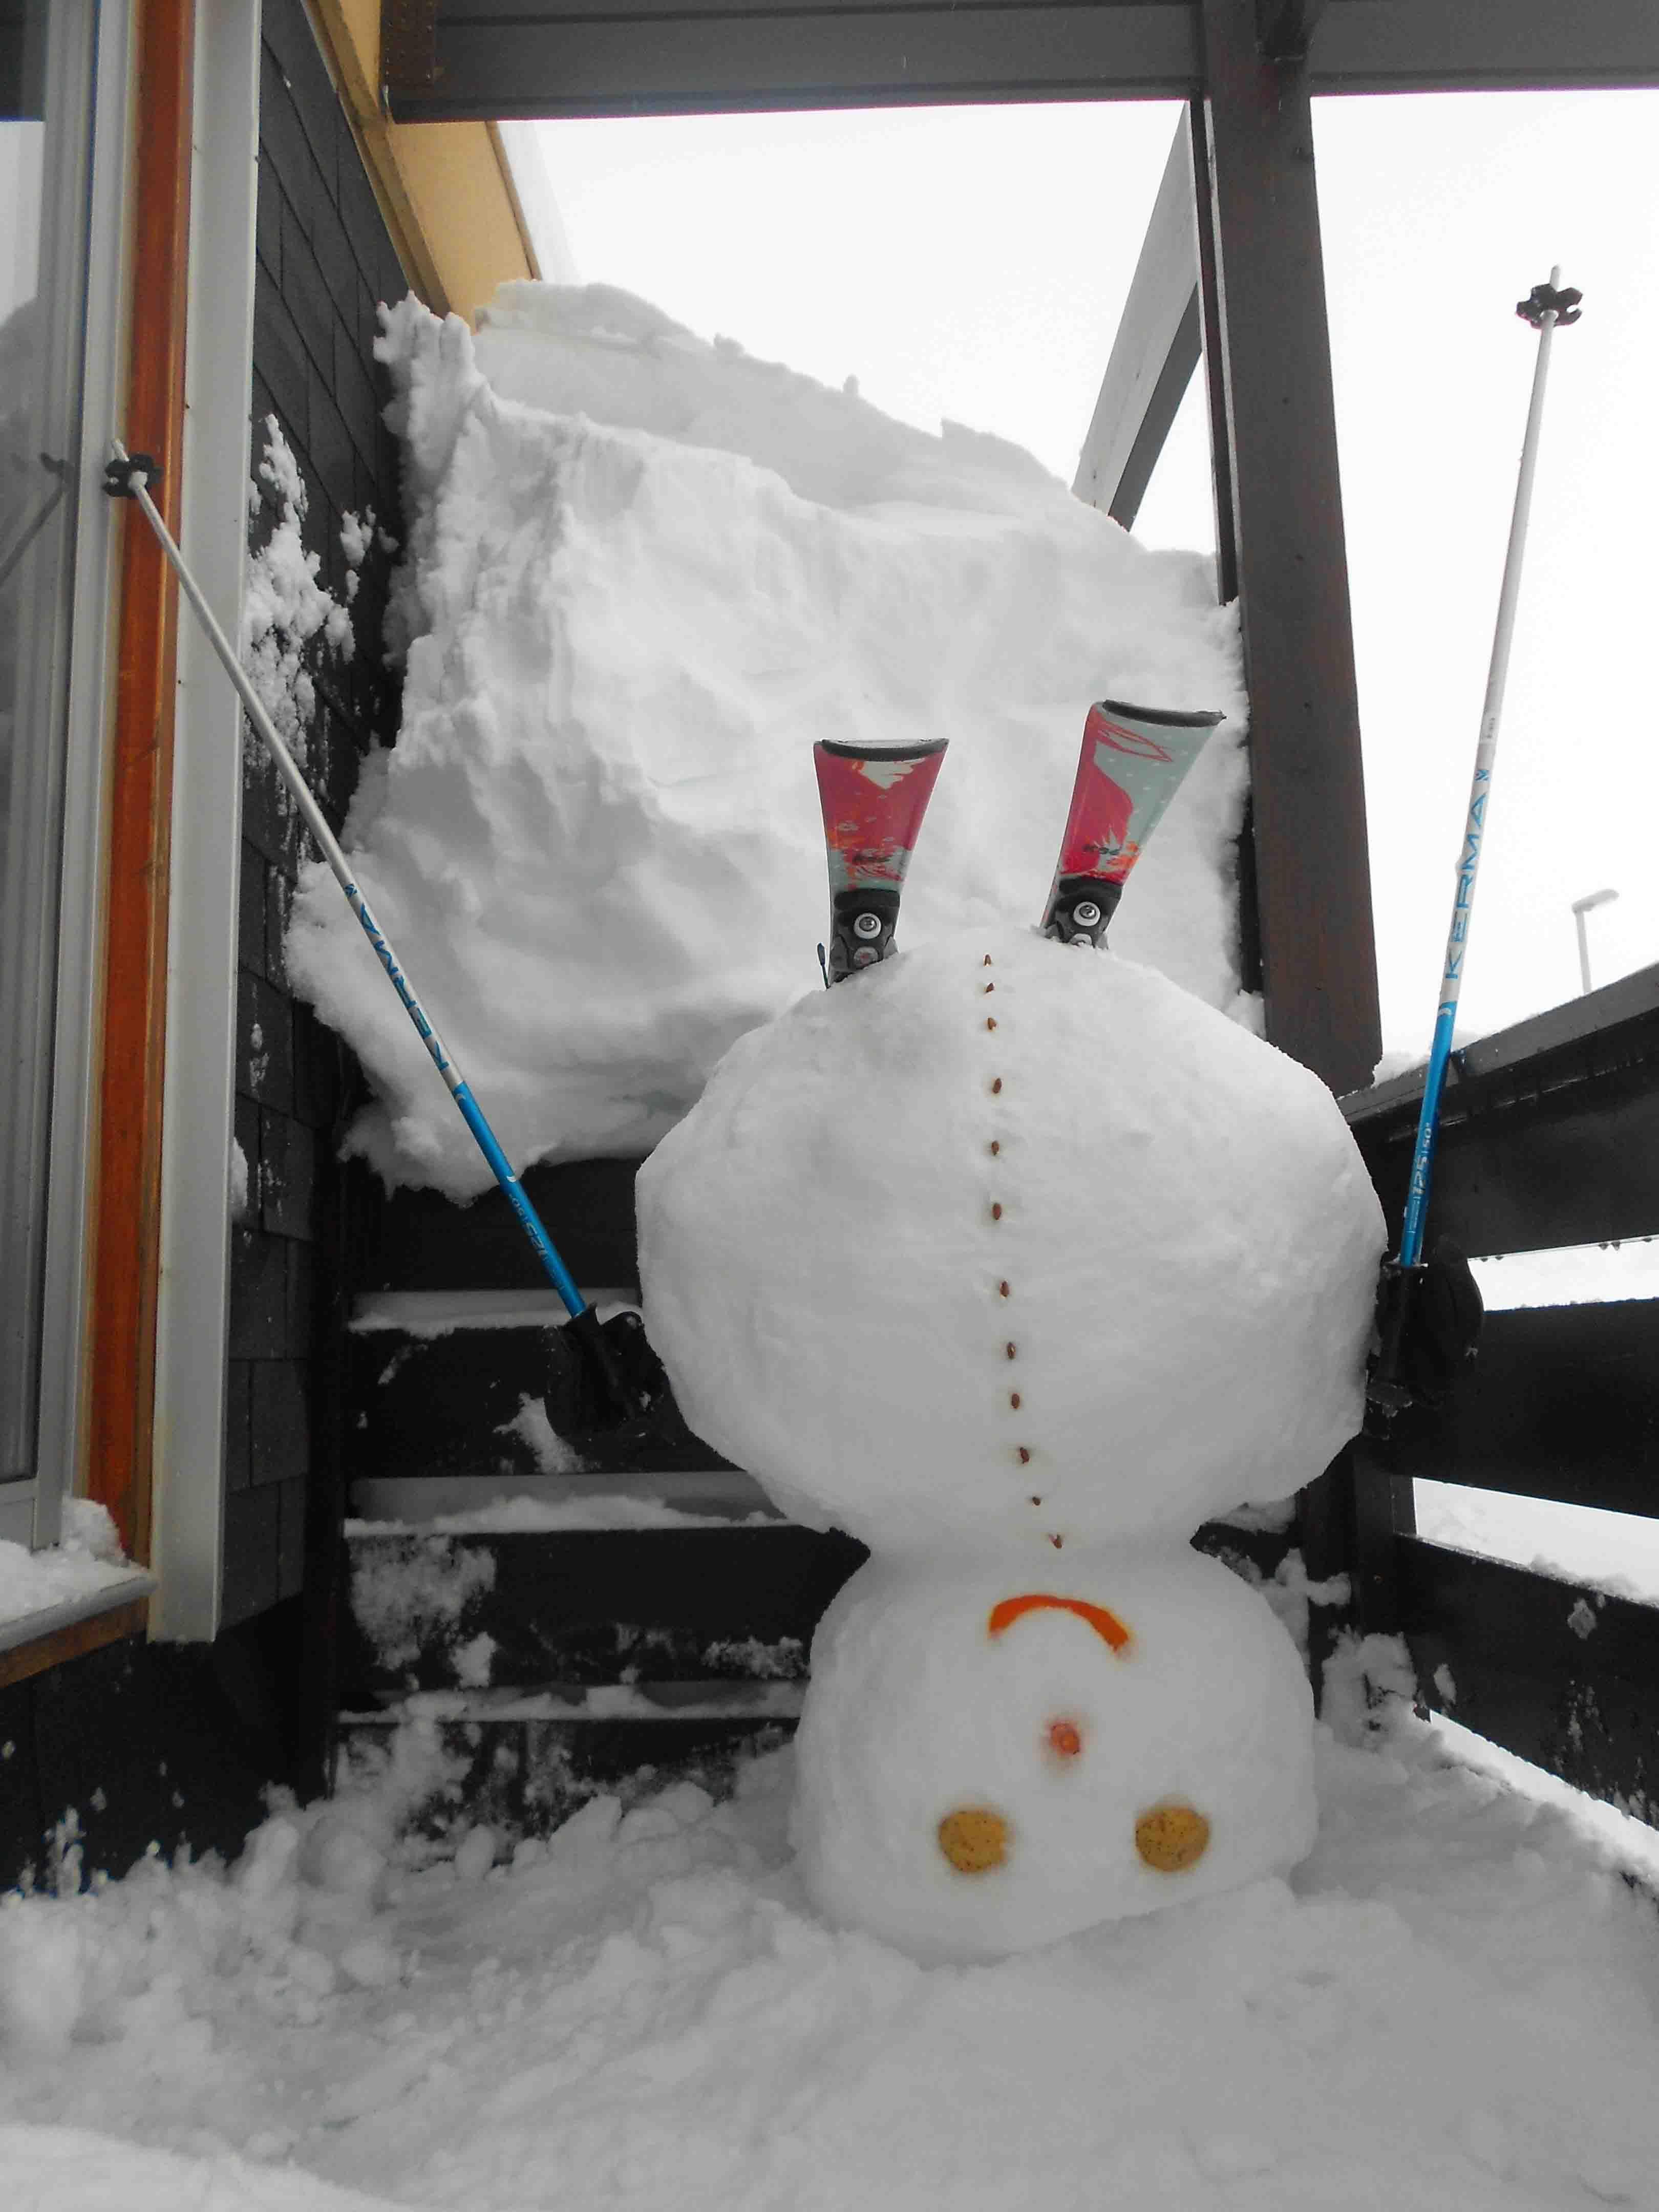 Bonhomme de neige la tête en bas. Inspiration http://pinterest.com/pin/542613455074031992/